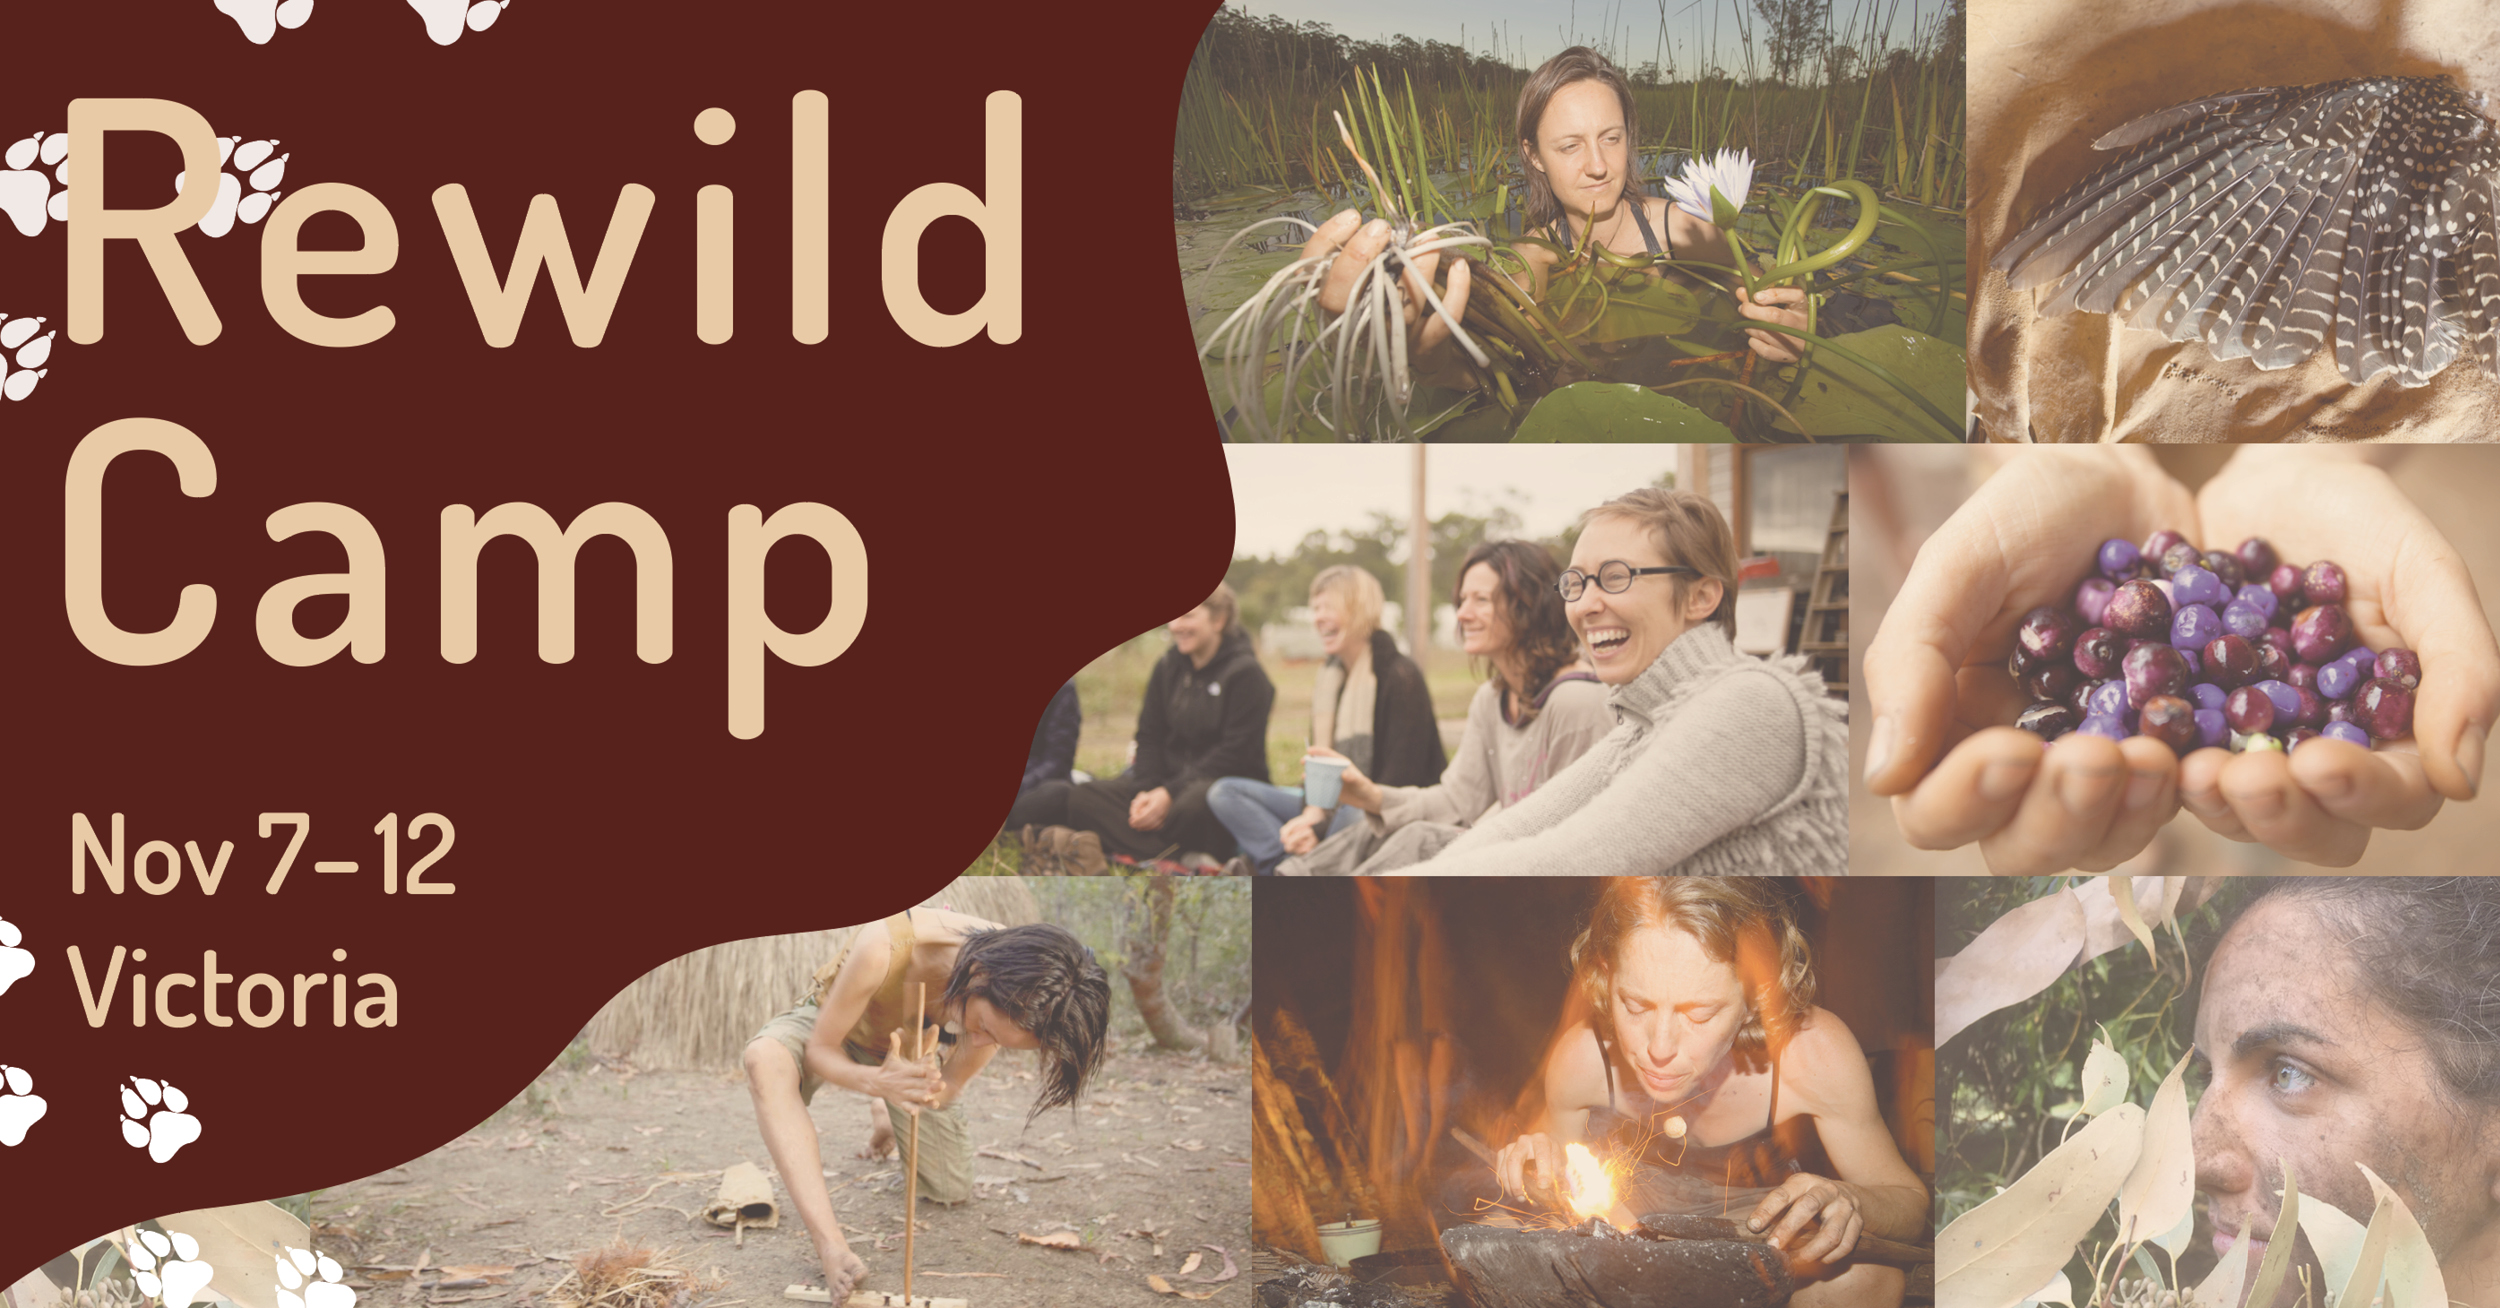 Claire-dunn-rewild-camp-01.jpg